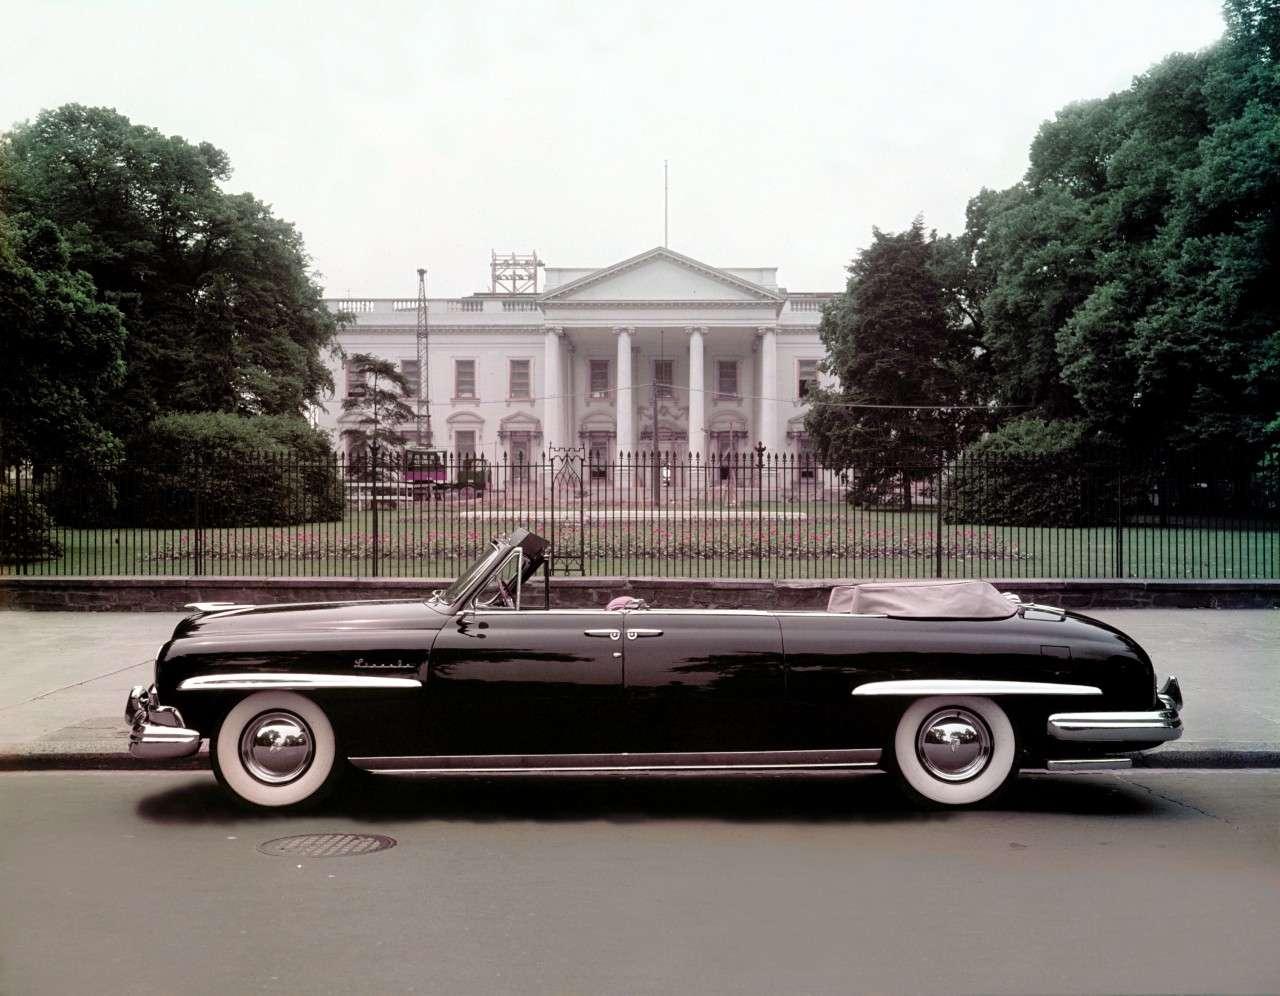 Lincoln Continental Presidential Limo πολύτιμα αυτοκίνητα